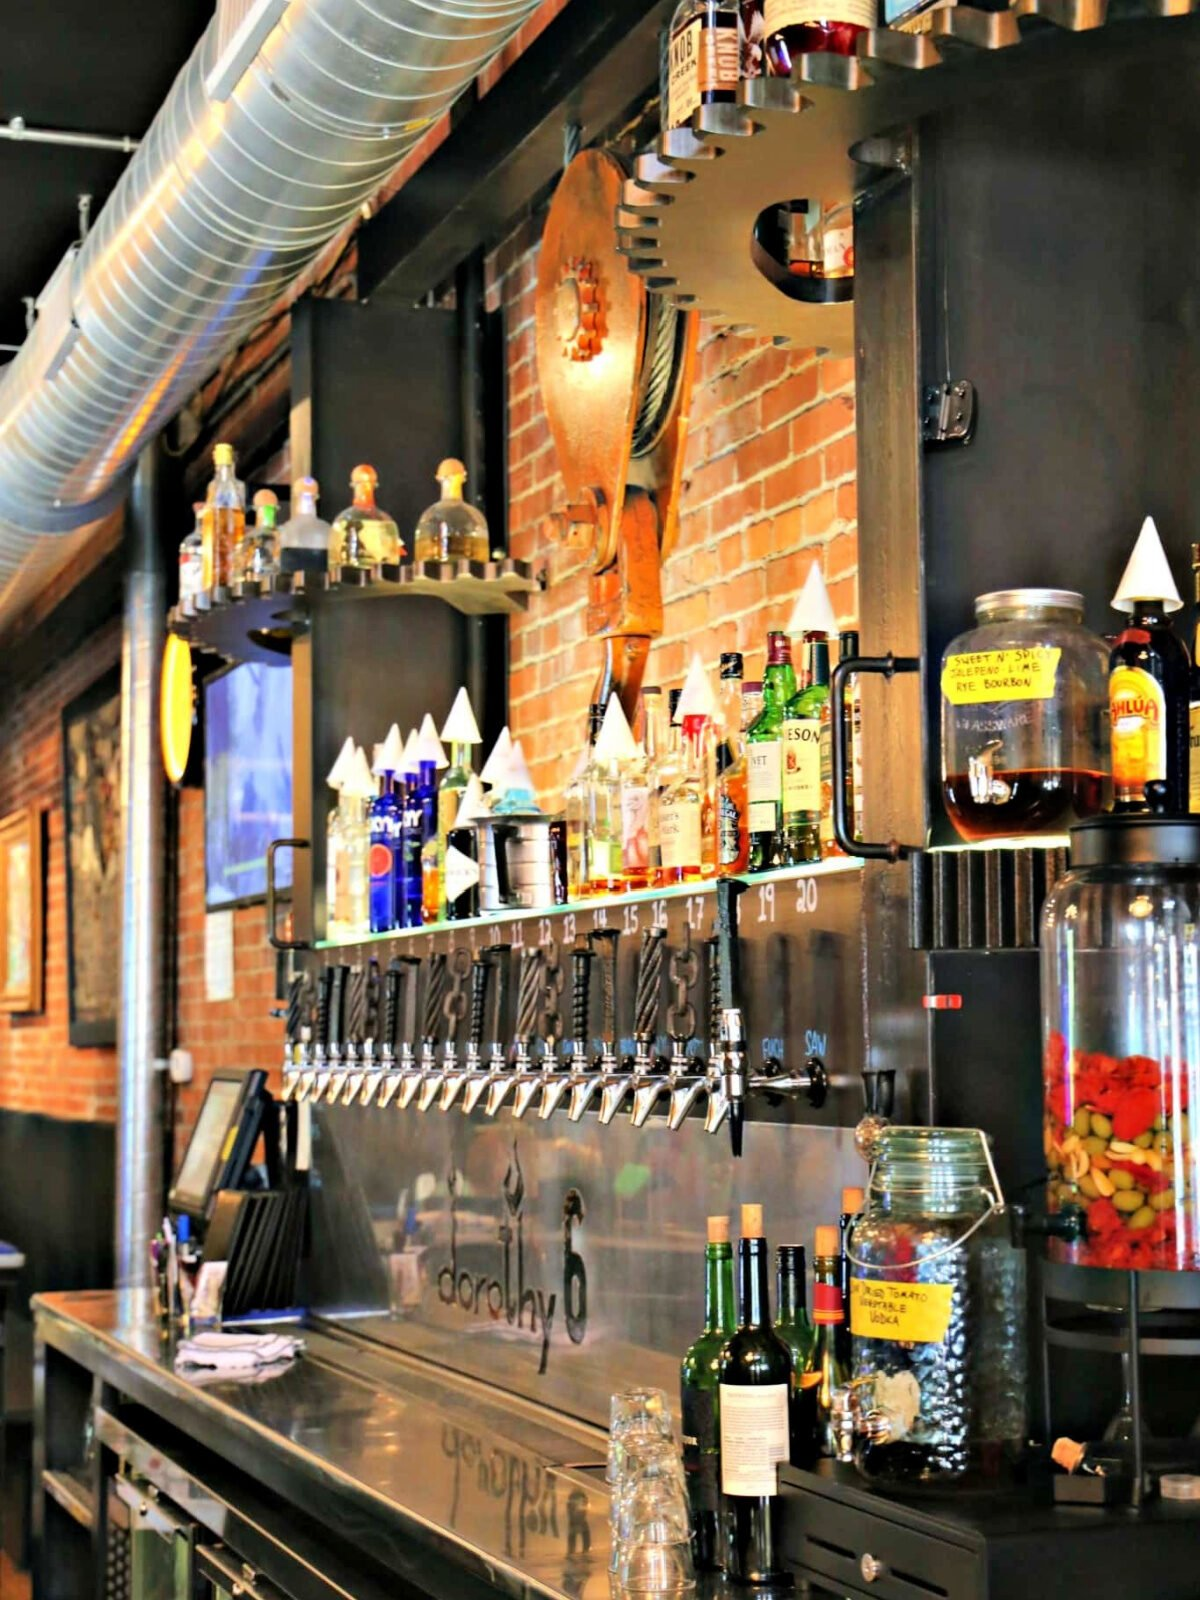 Beer dispenser at the bar inside Dorothy 6 in Pittsburgh.